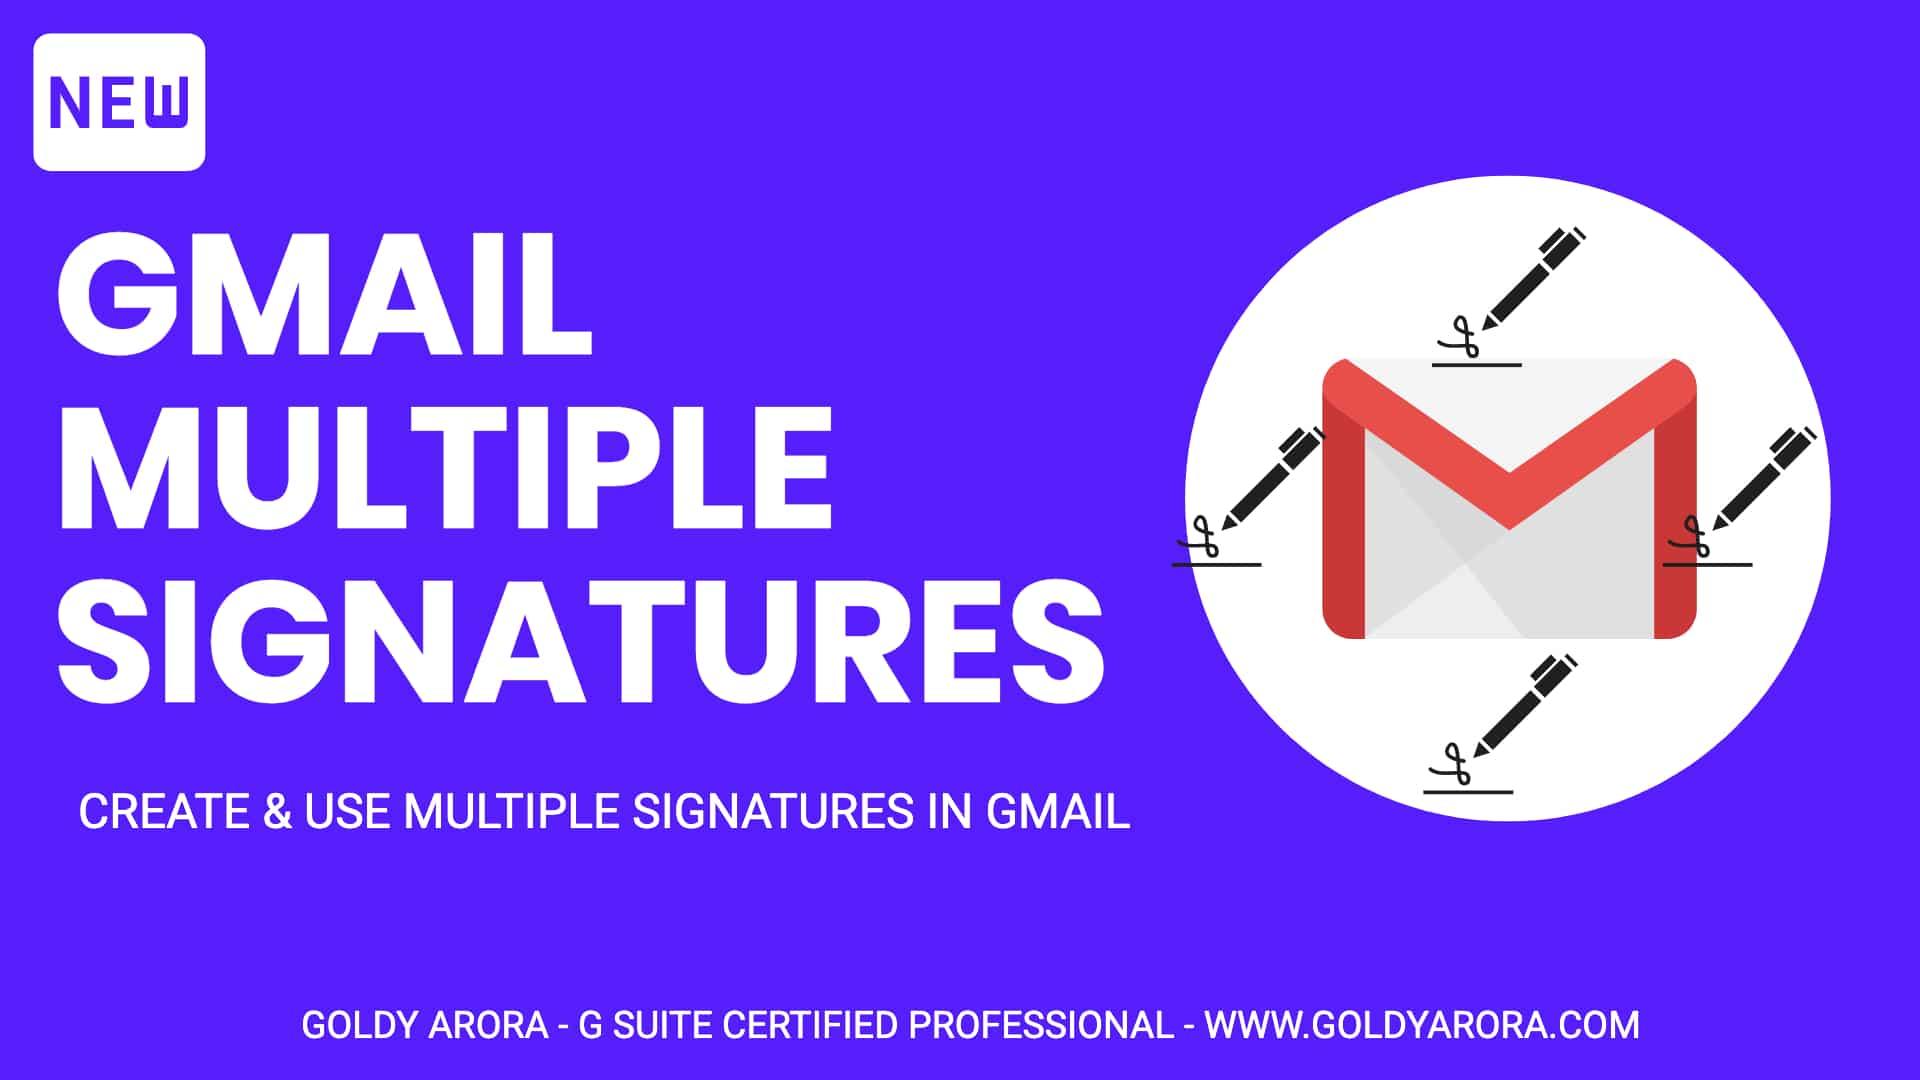 Gmail Multiple Signatures - Create & Use multiple Signatures in Gmail